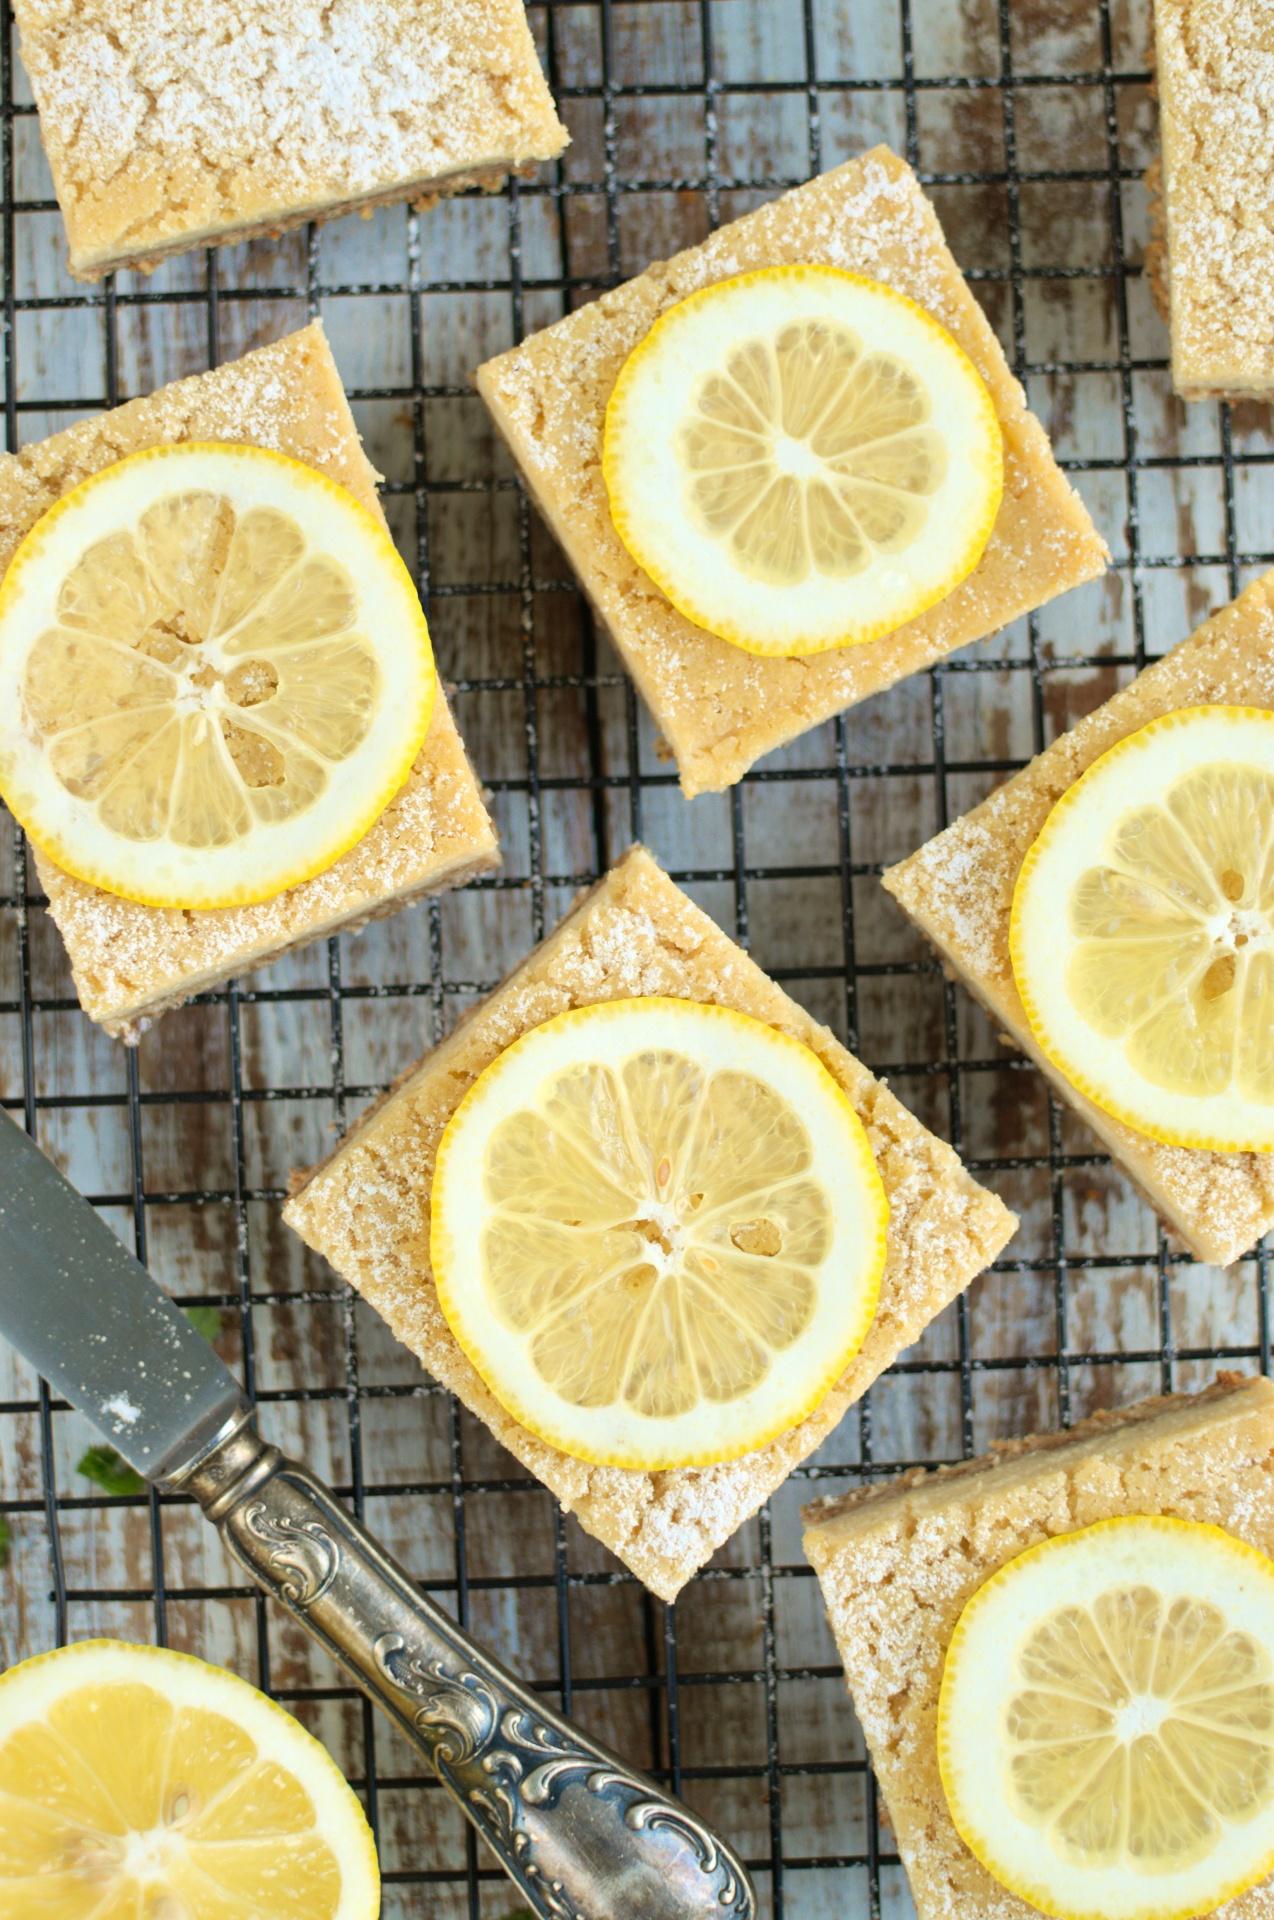 Cytrynowe kostki (vegan lemon bars)